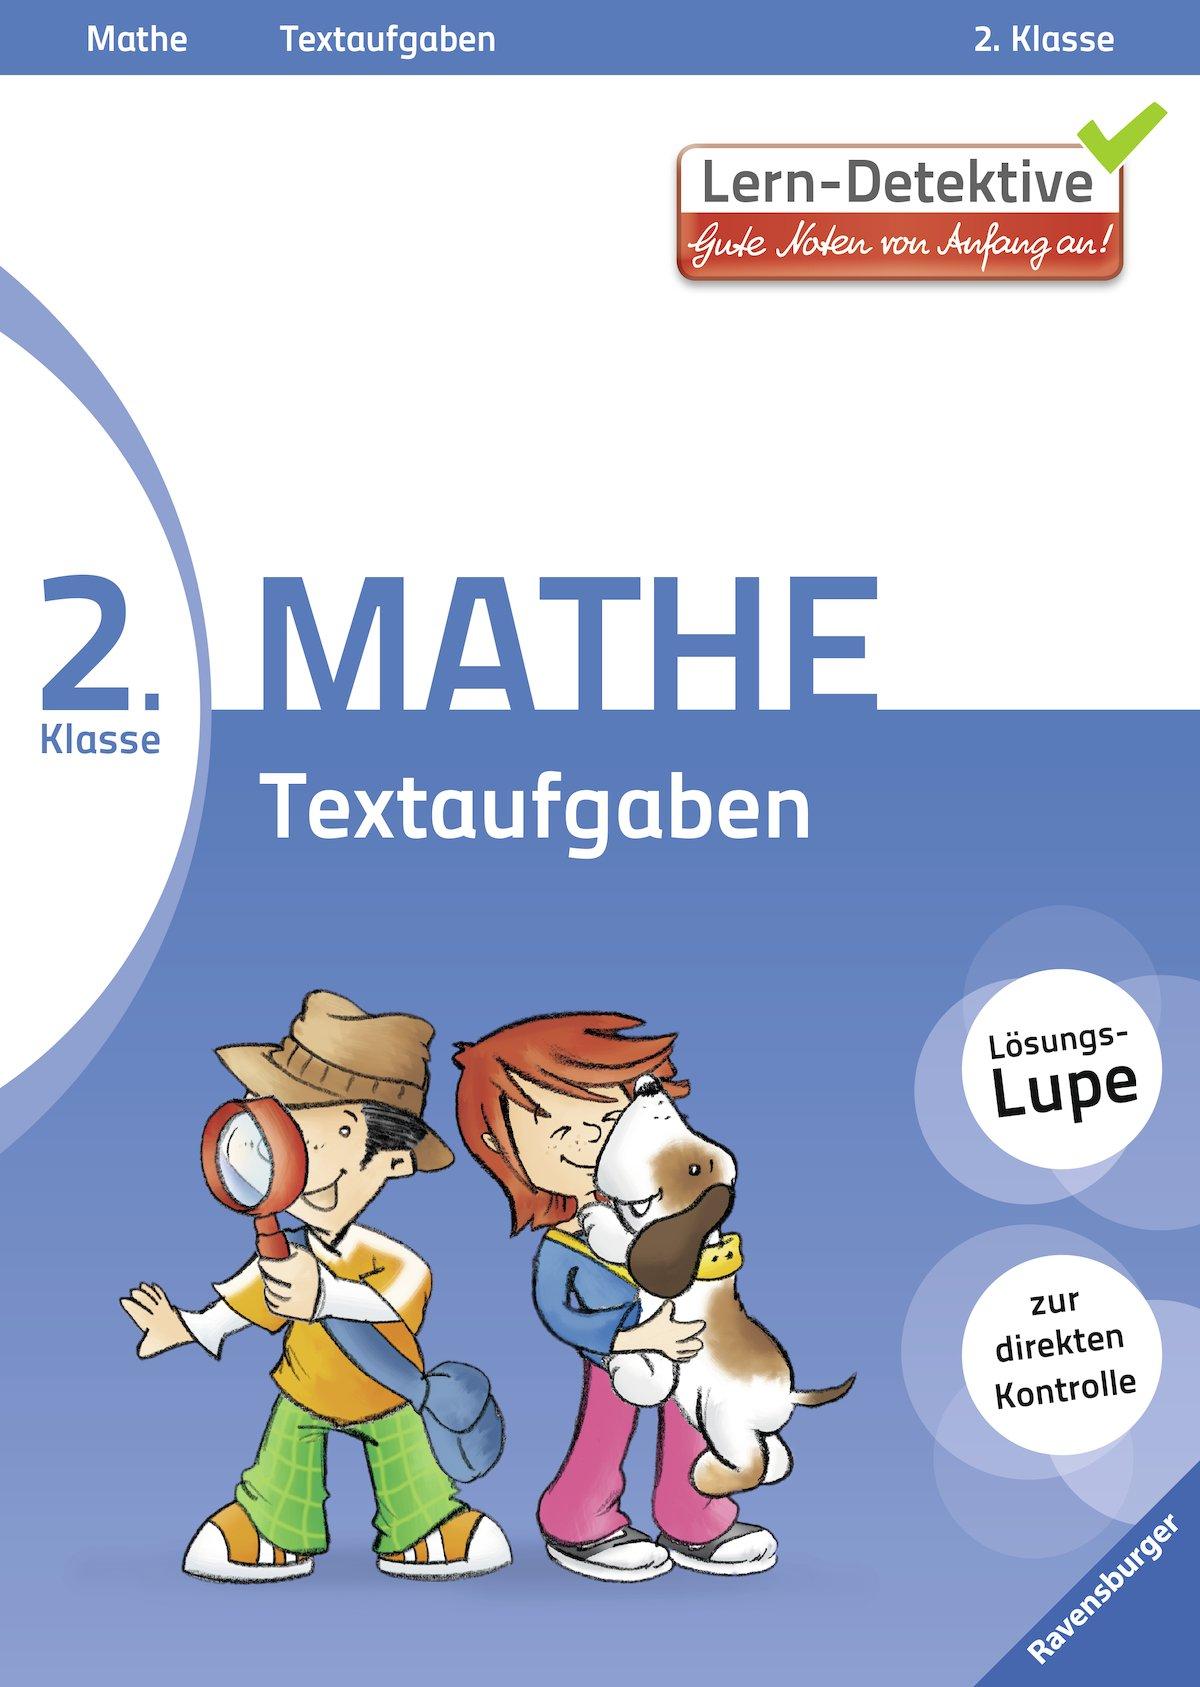 Textaufgaben (Mathe 2. Klasse) (Lern-Detektive): Amazon.de: Silke ...